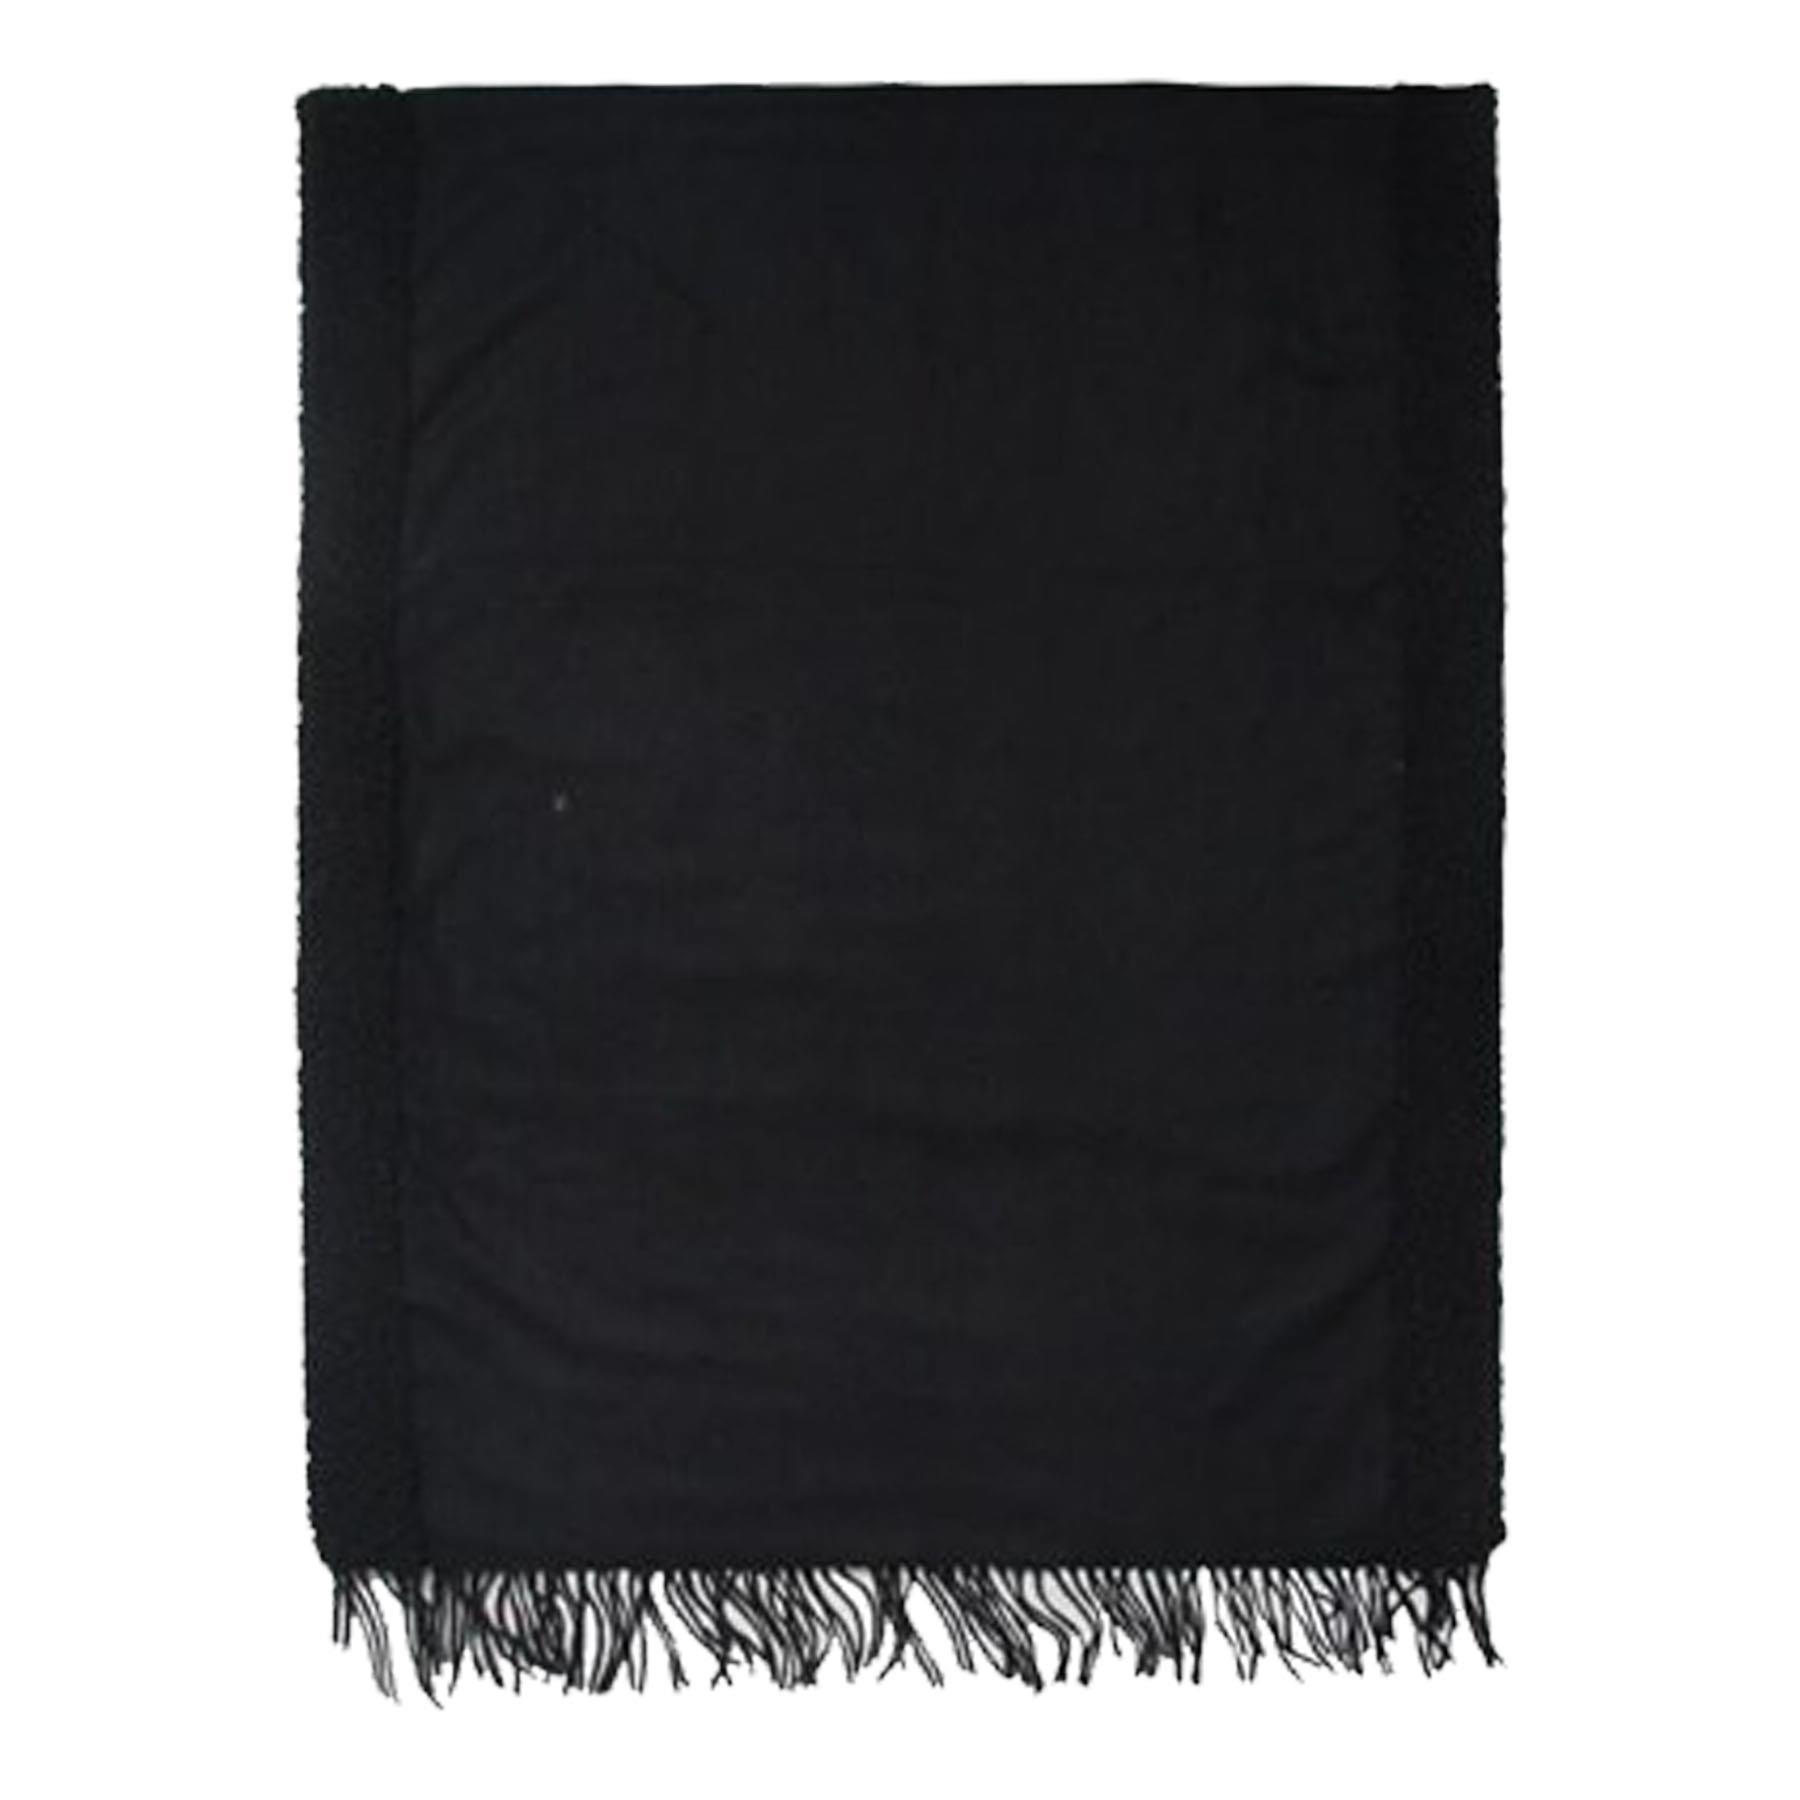 New-Women-s-Synthetic-Fur-Fleece-Trimming-Winter-Large-Shawl-Wrap thumbnail 3